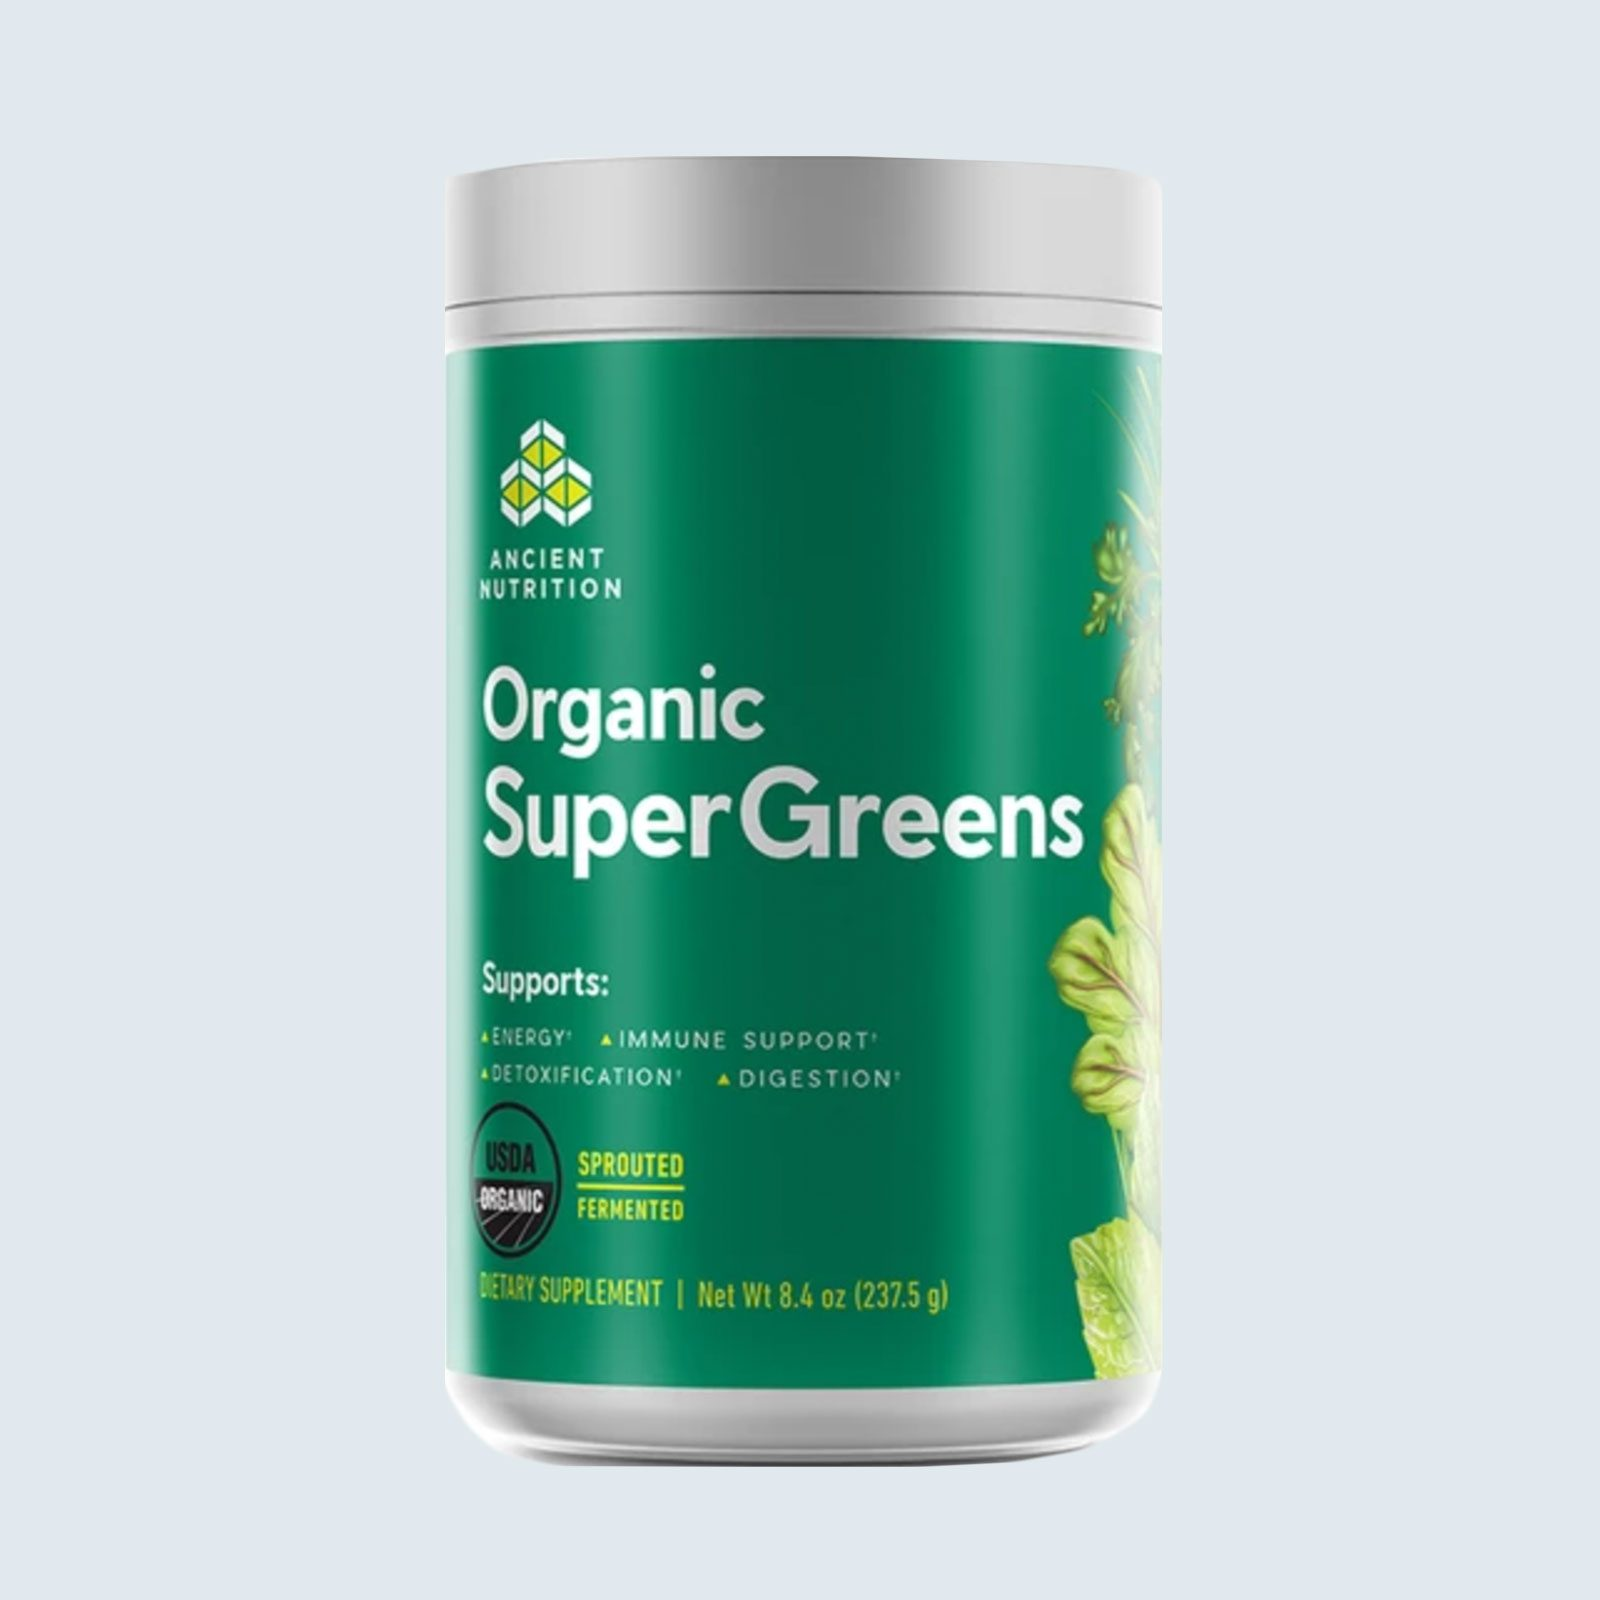 Ancient Nutrition Organic SuperGreens